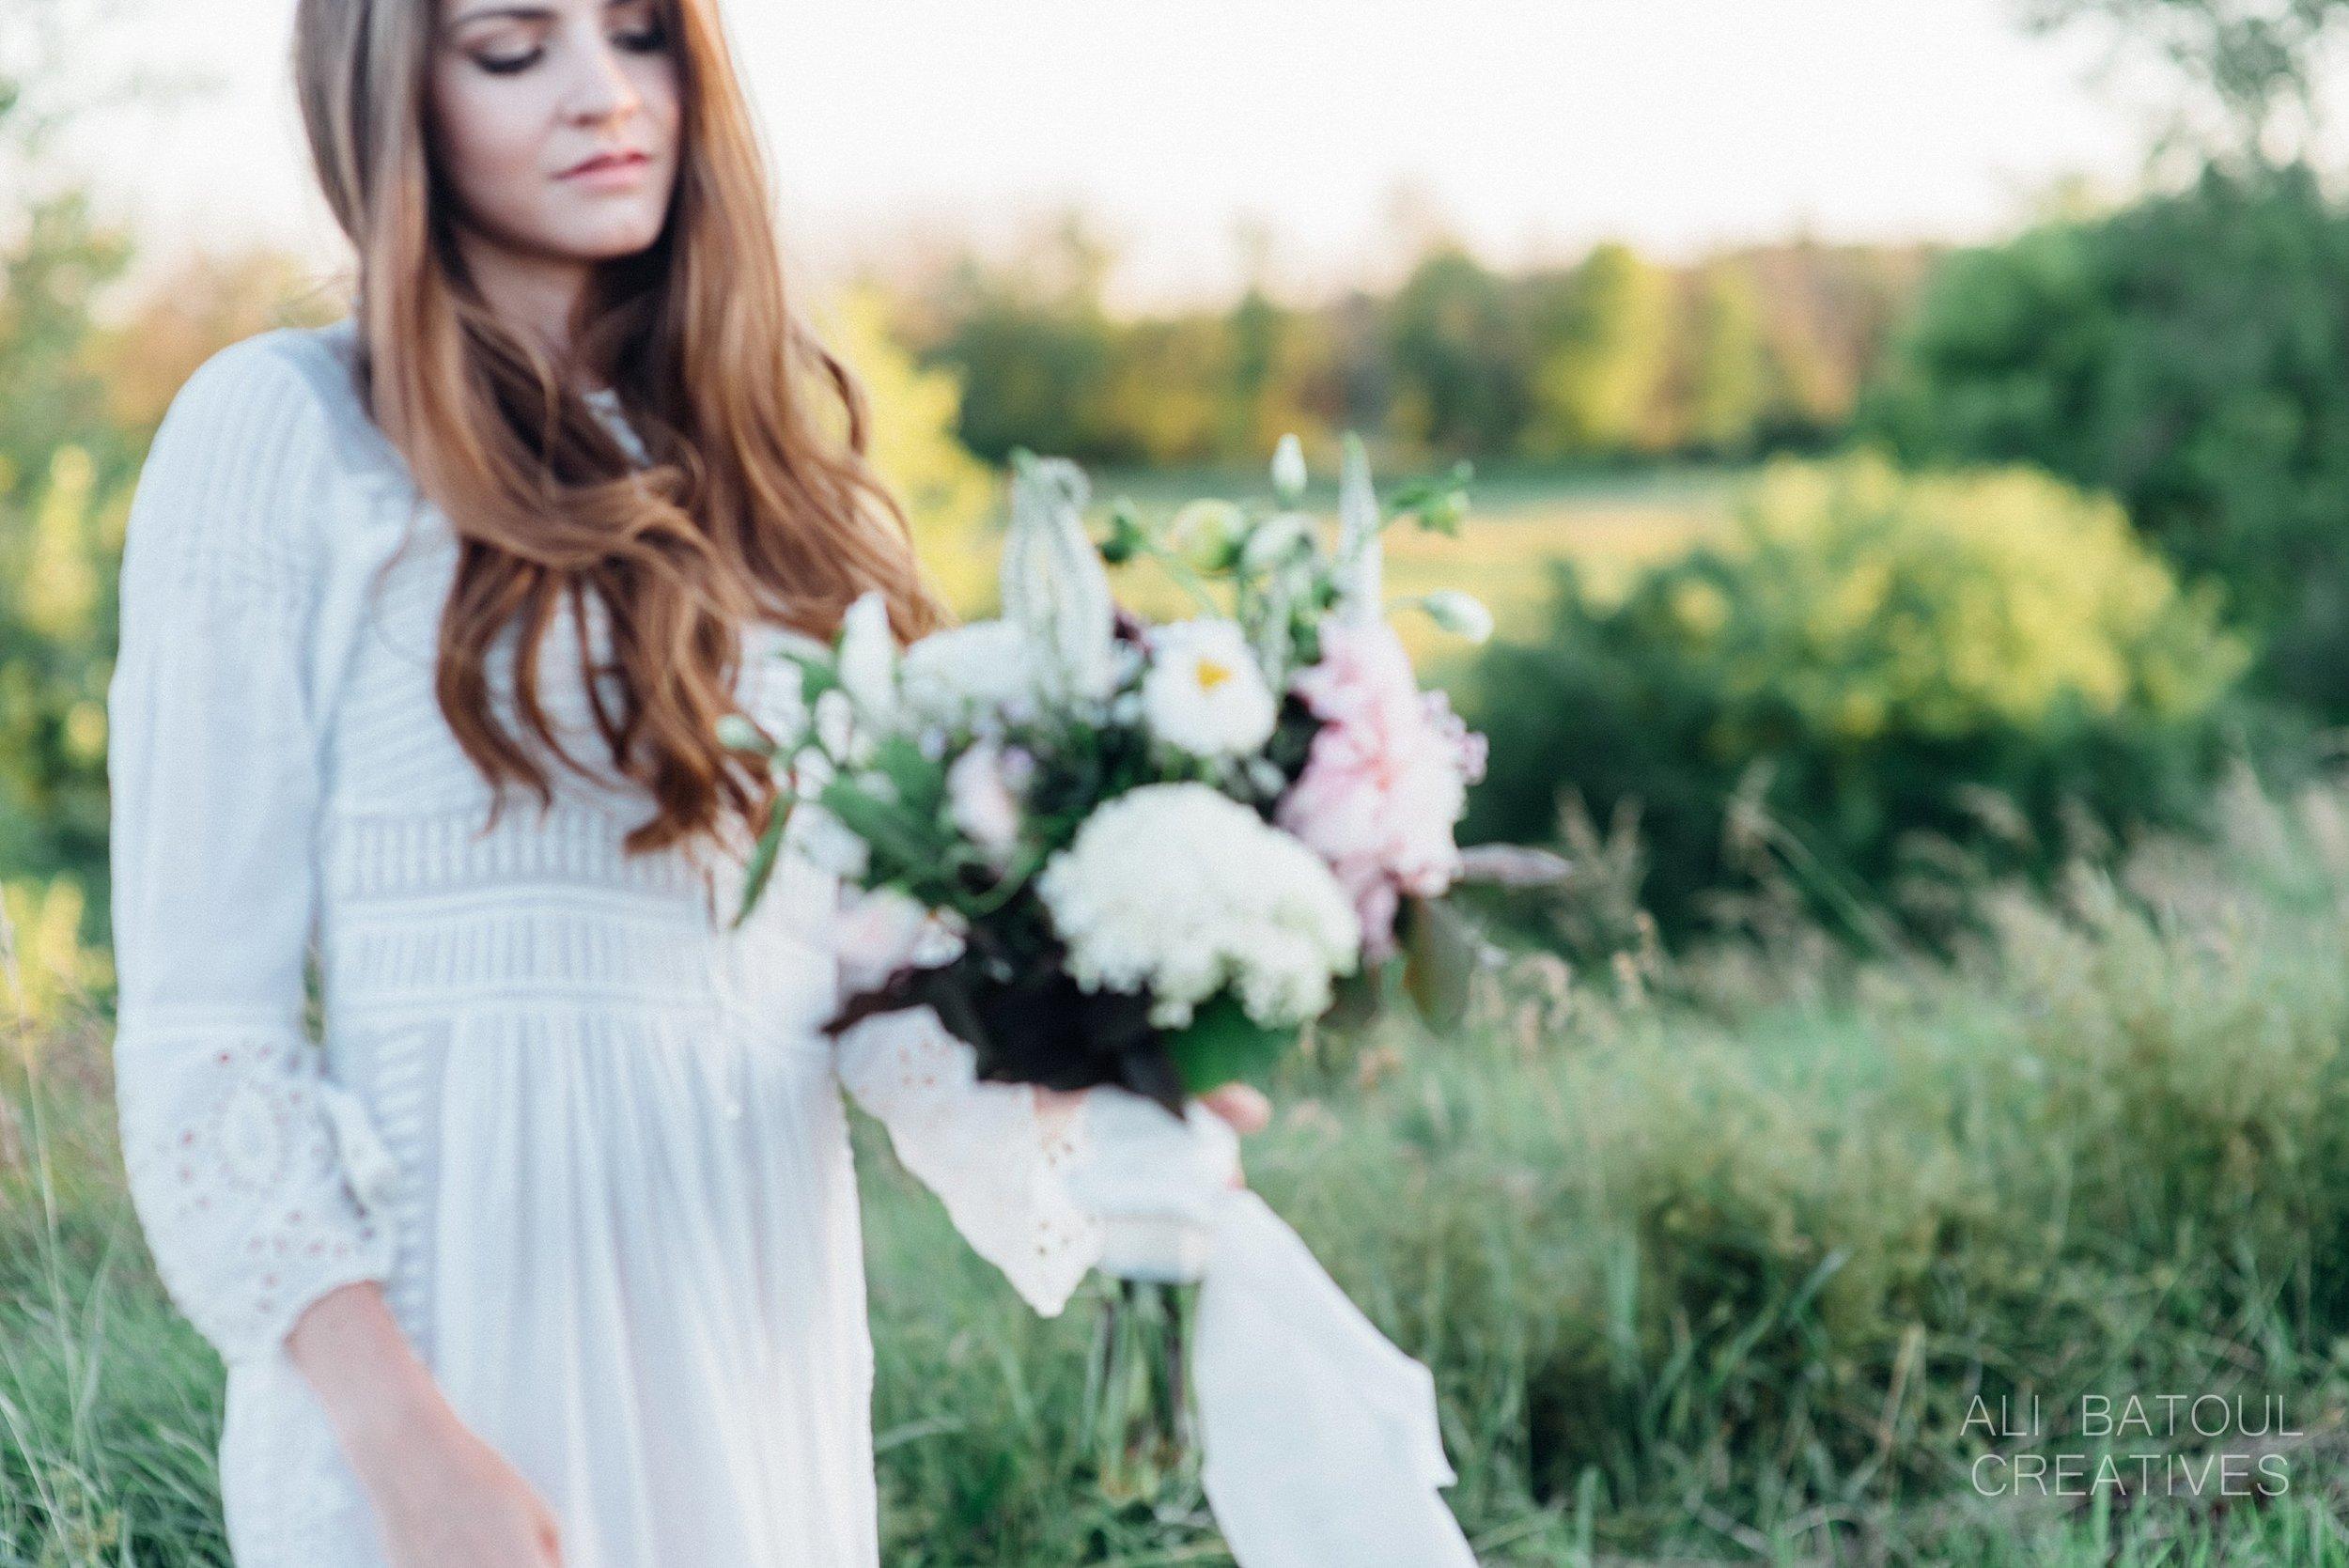 Boho Bridal Ottawa - Ali Batoul Creatives Fine Art Wedding Photography_0368.jpg